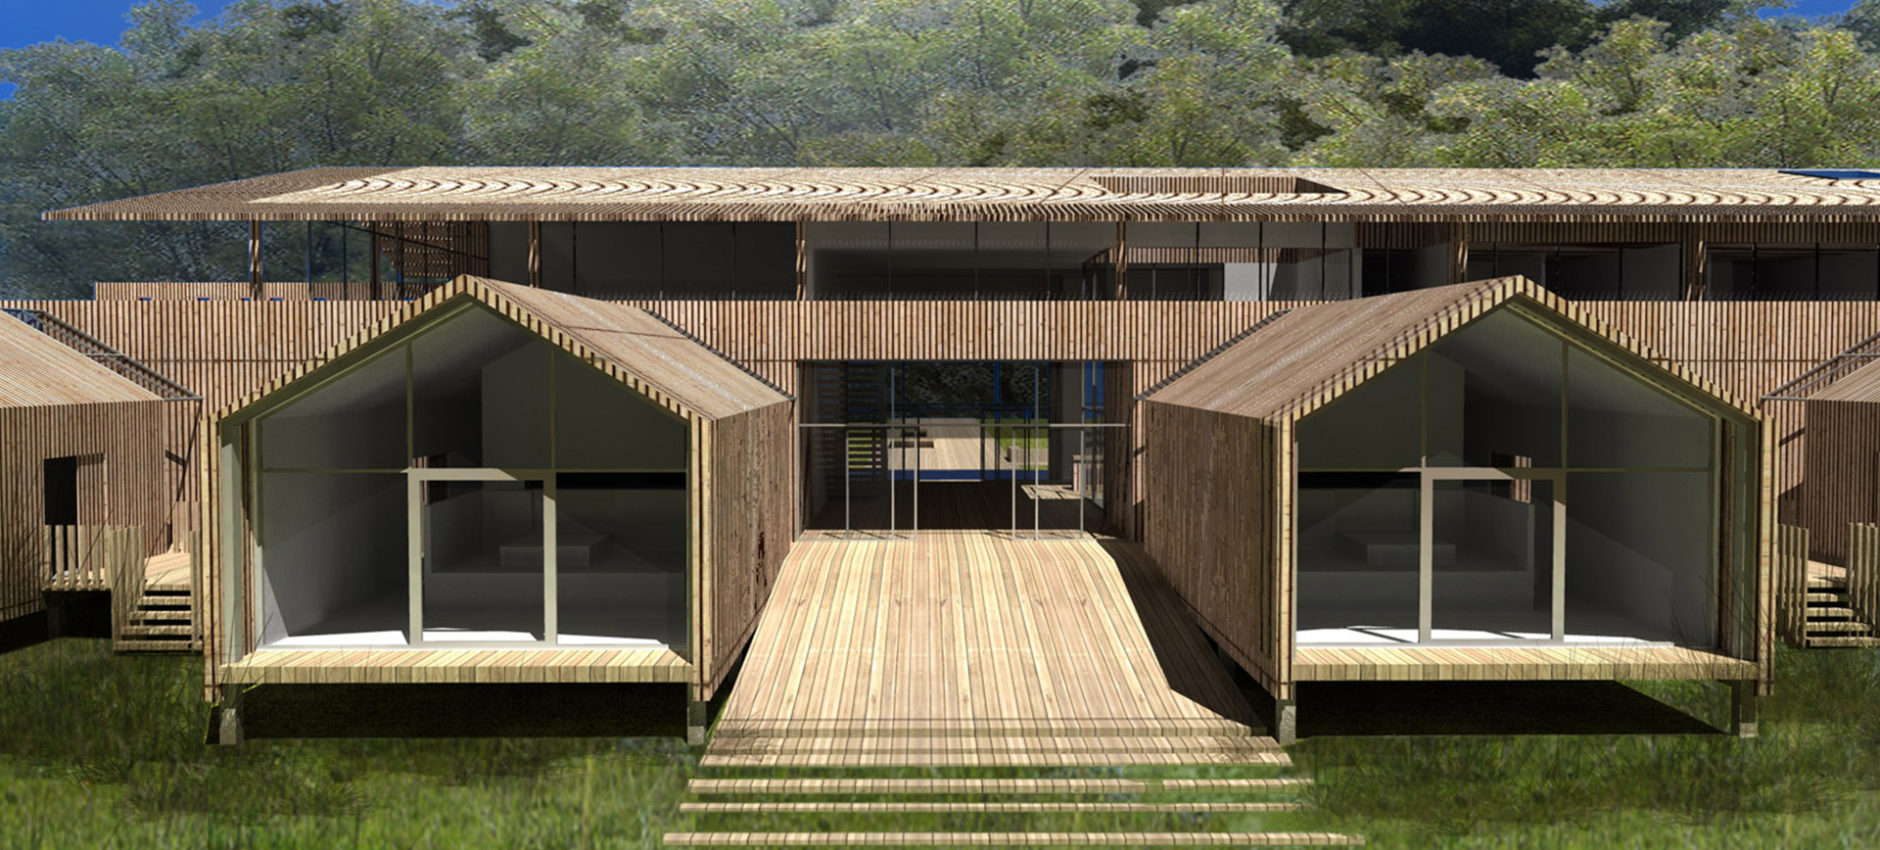 boca_architecture_projet_centre_thalasso_lanton_01.jpg